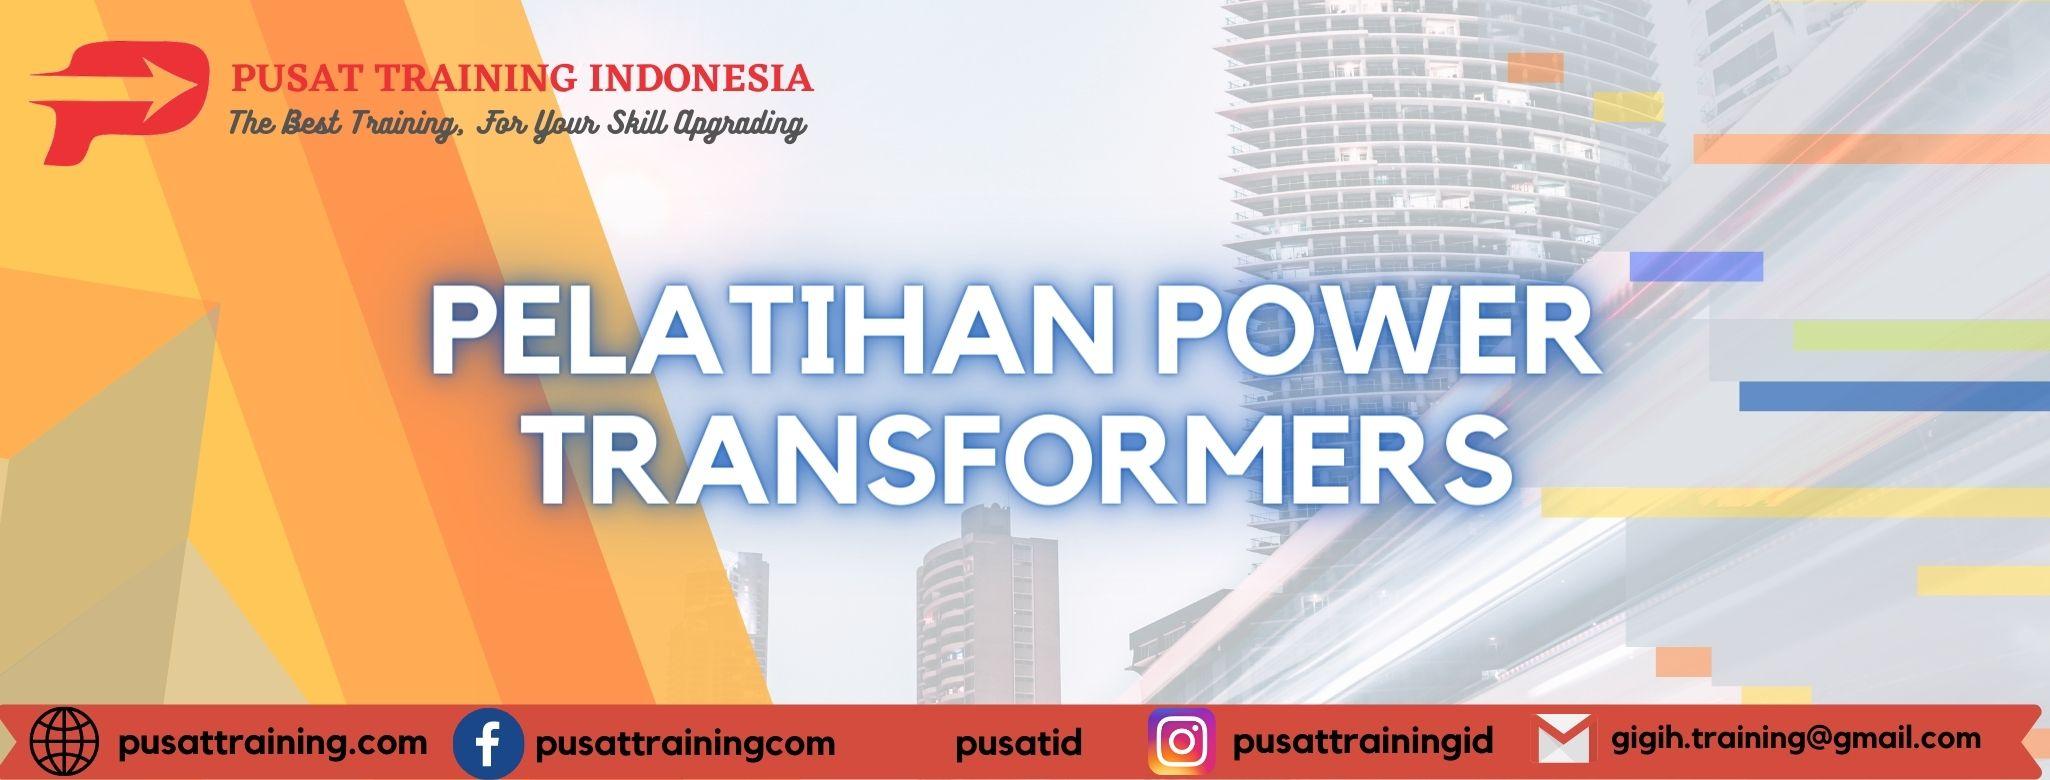 pelatihan-power-transformers